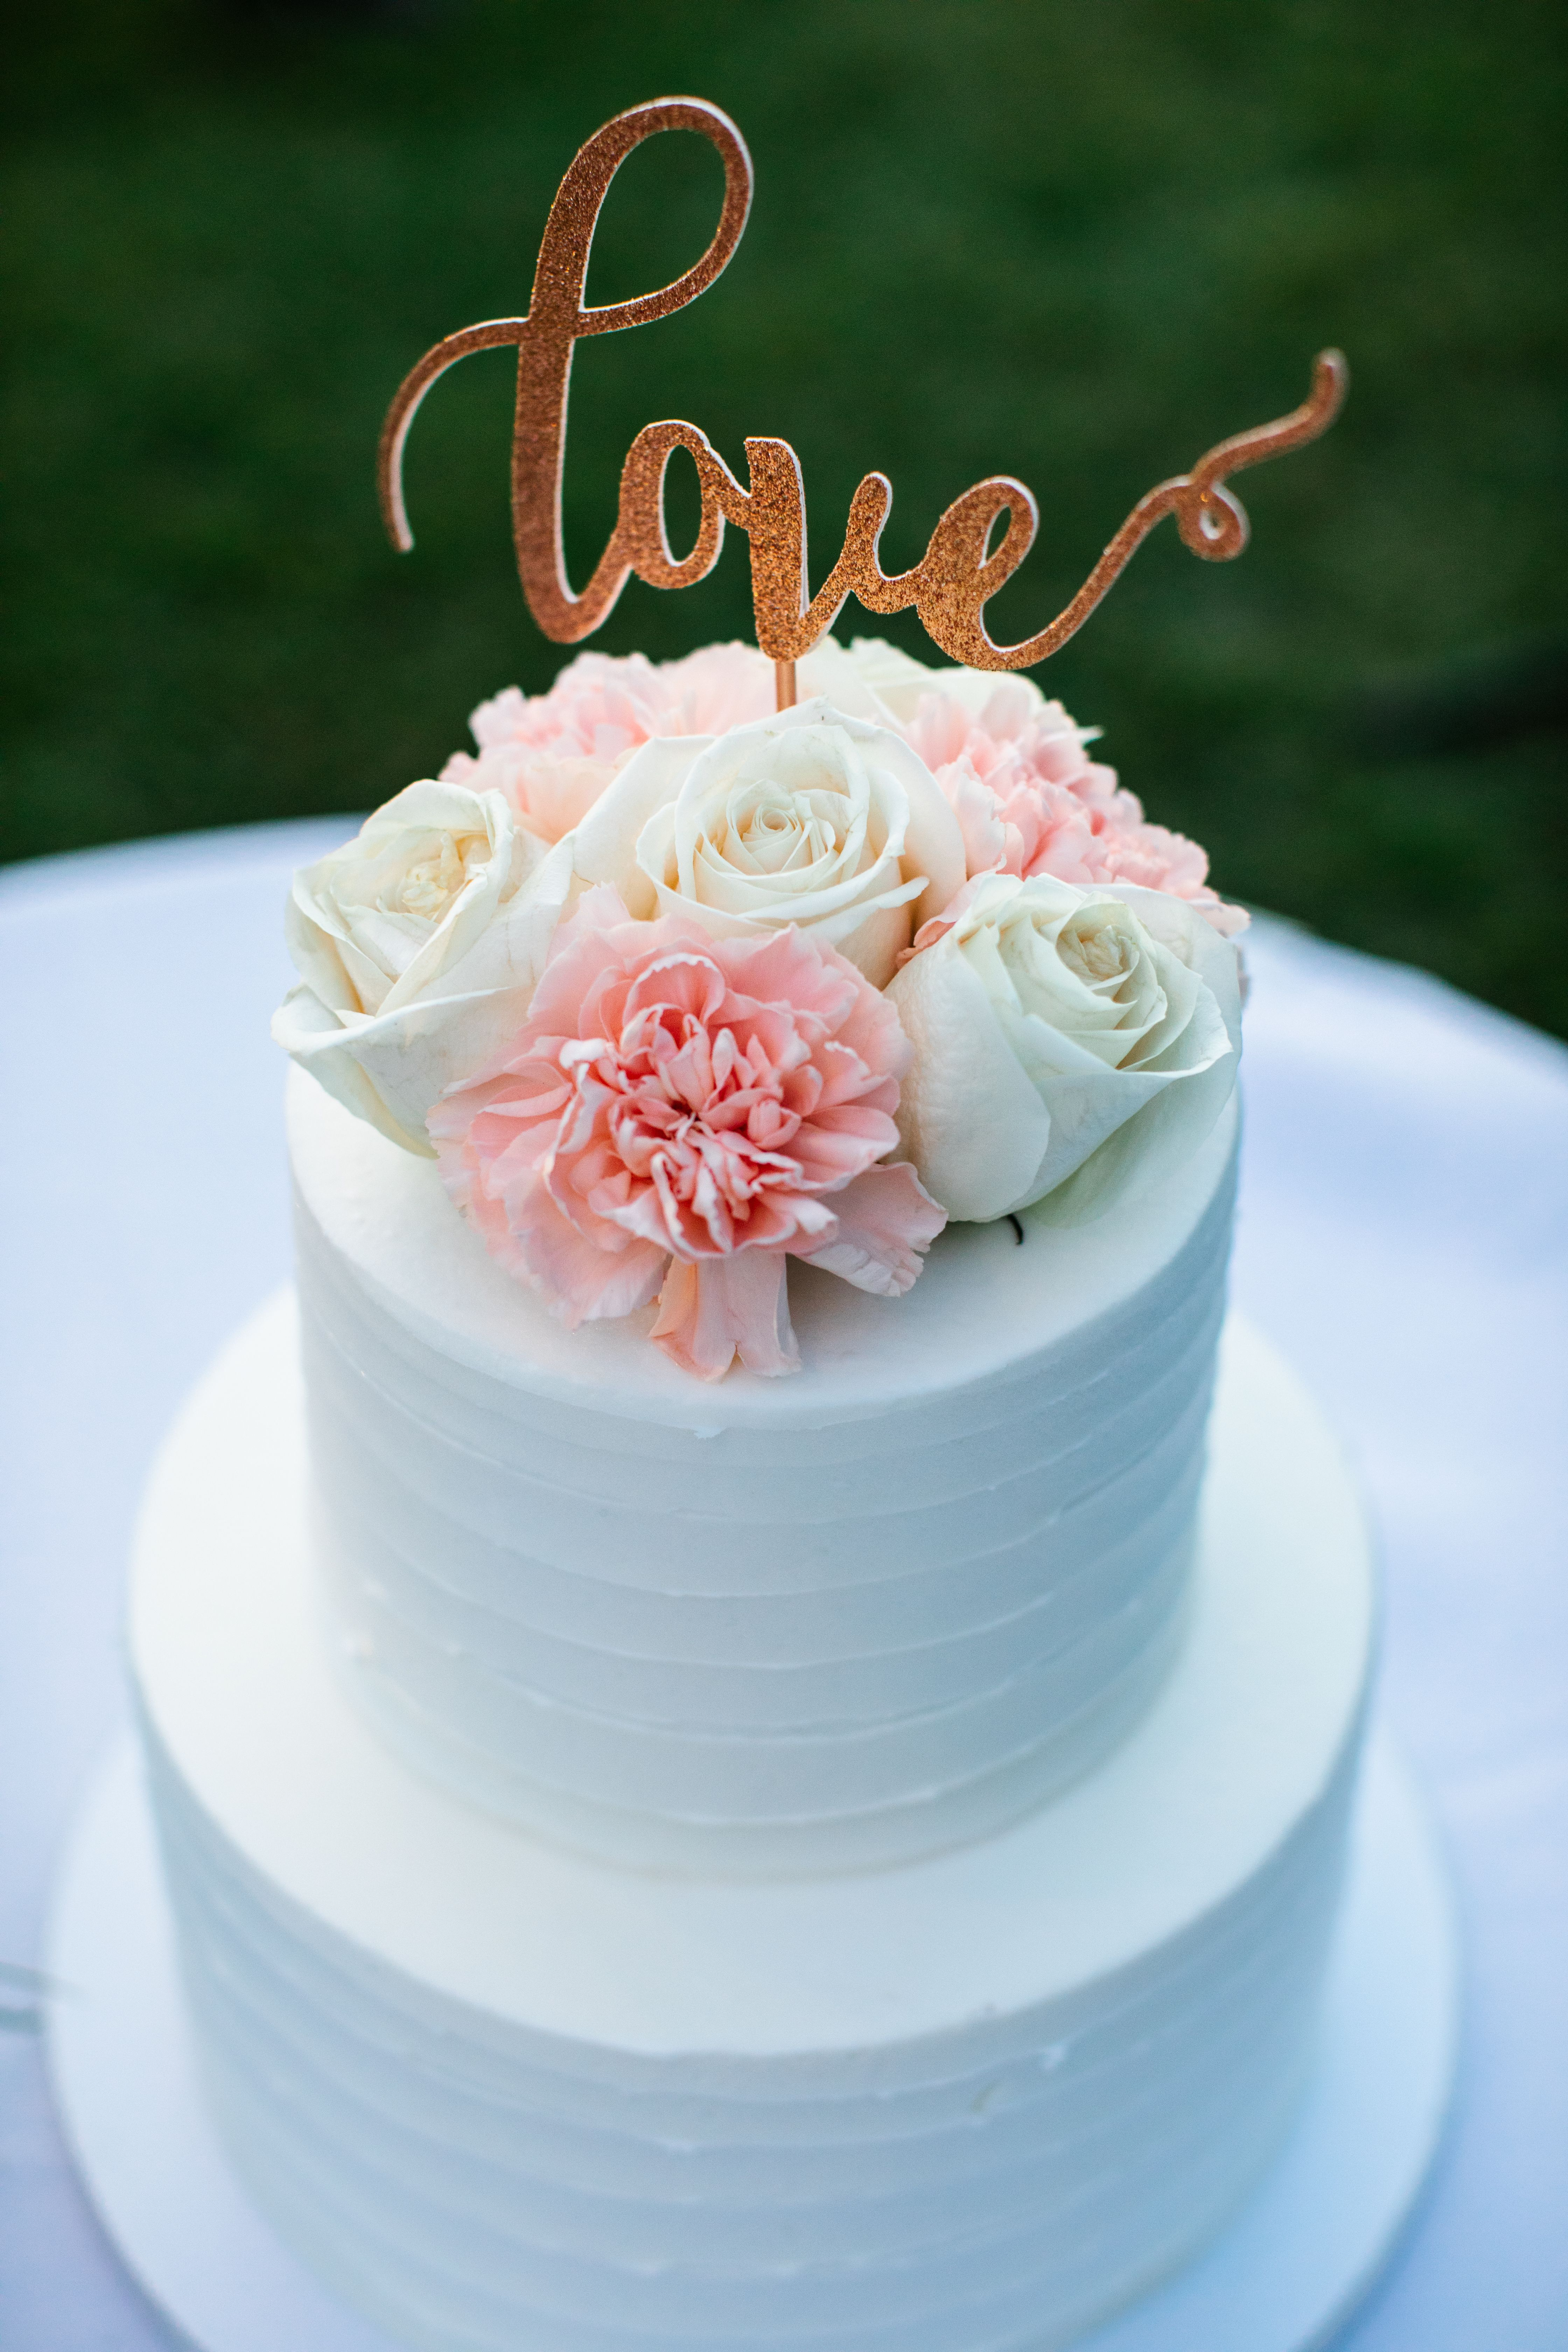 Pin by Ashley Kidd on Wedding Food, Cake, Desserts